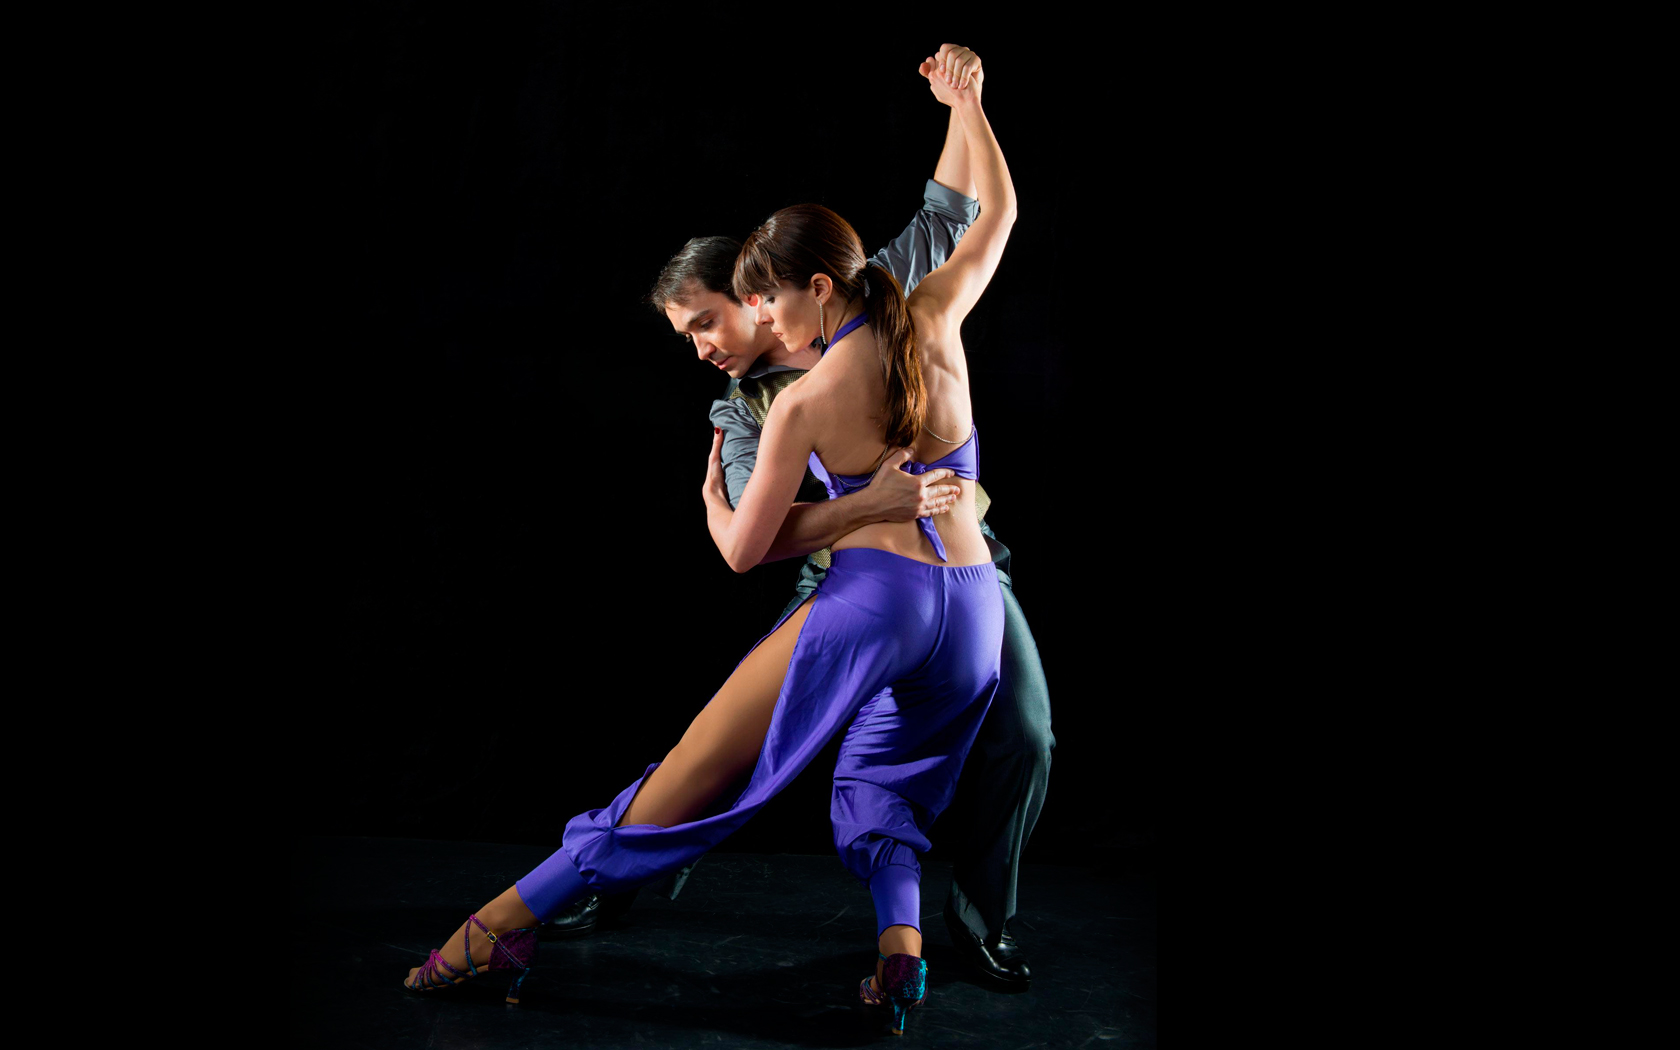 Clases de Baile en Madrid-Juan Brenes y Laura Holt-juanbrenesdancer